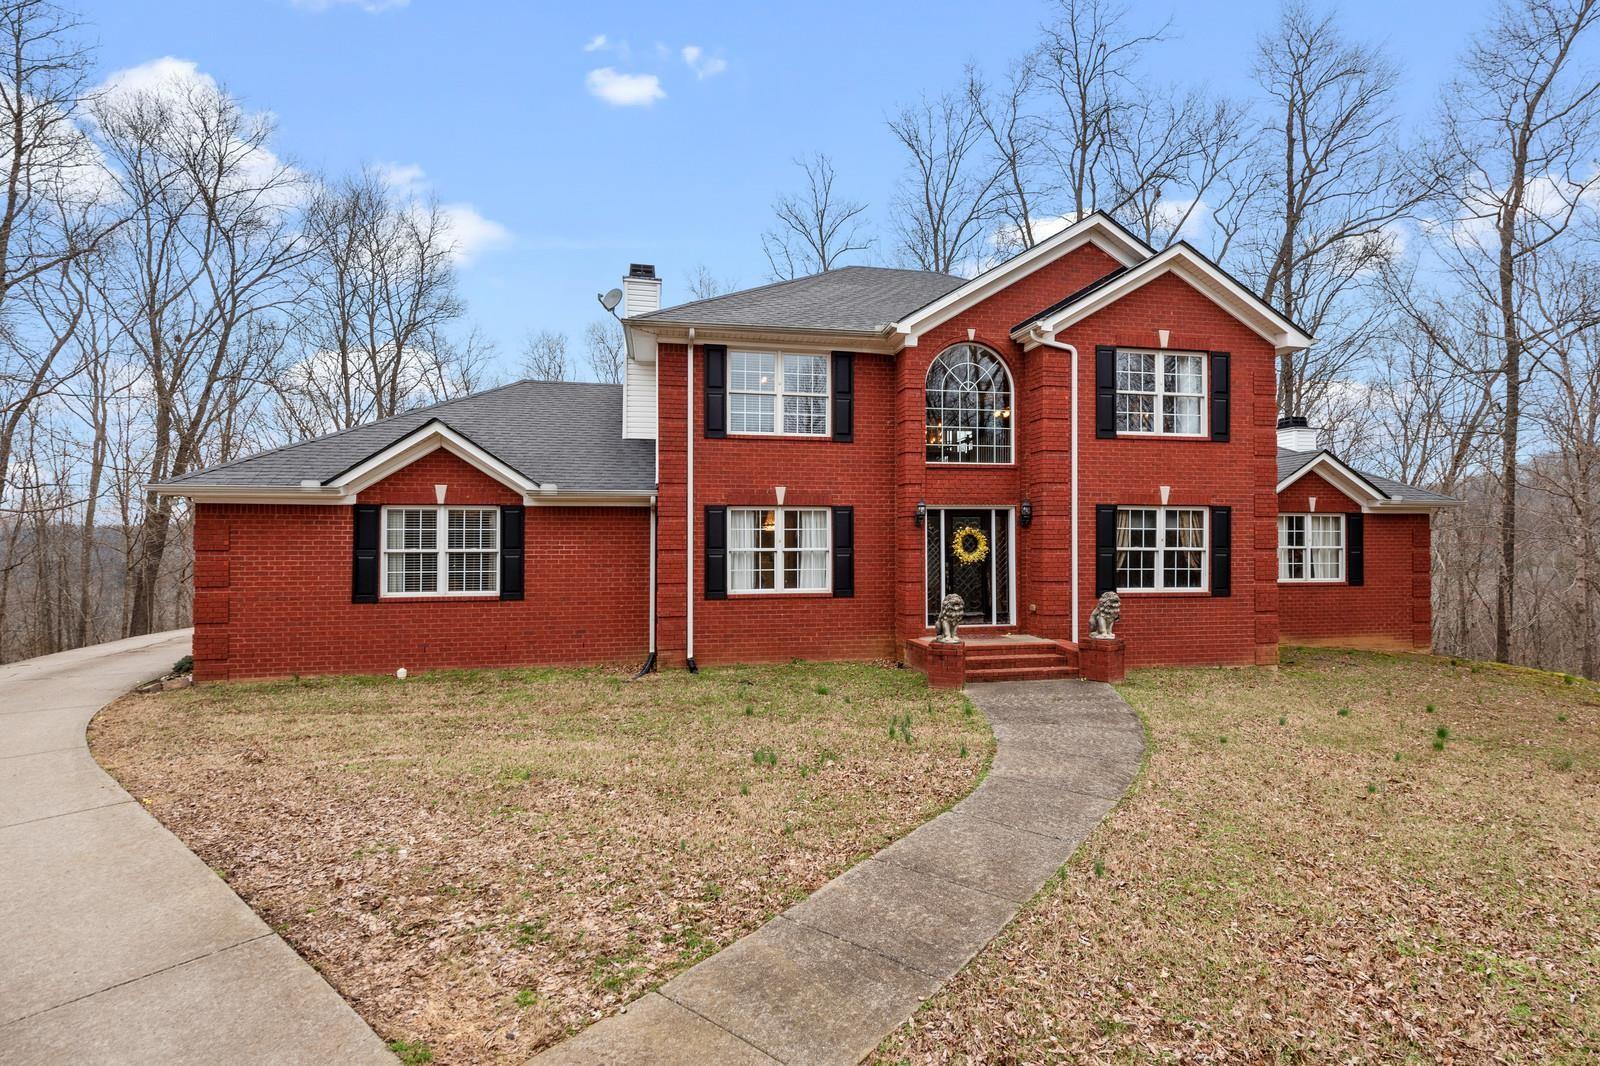 2239 Ingram Rd, Whites Creek, TN 37189 - Whites Creek, TN real estate listing